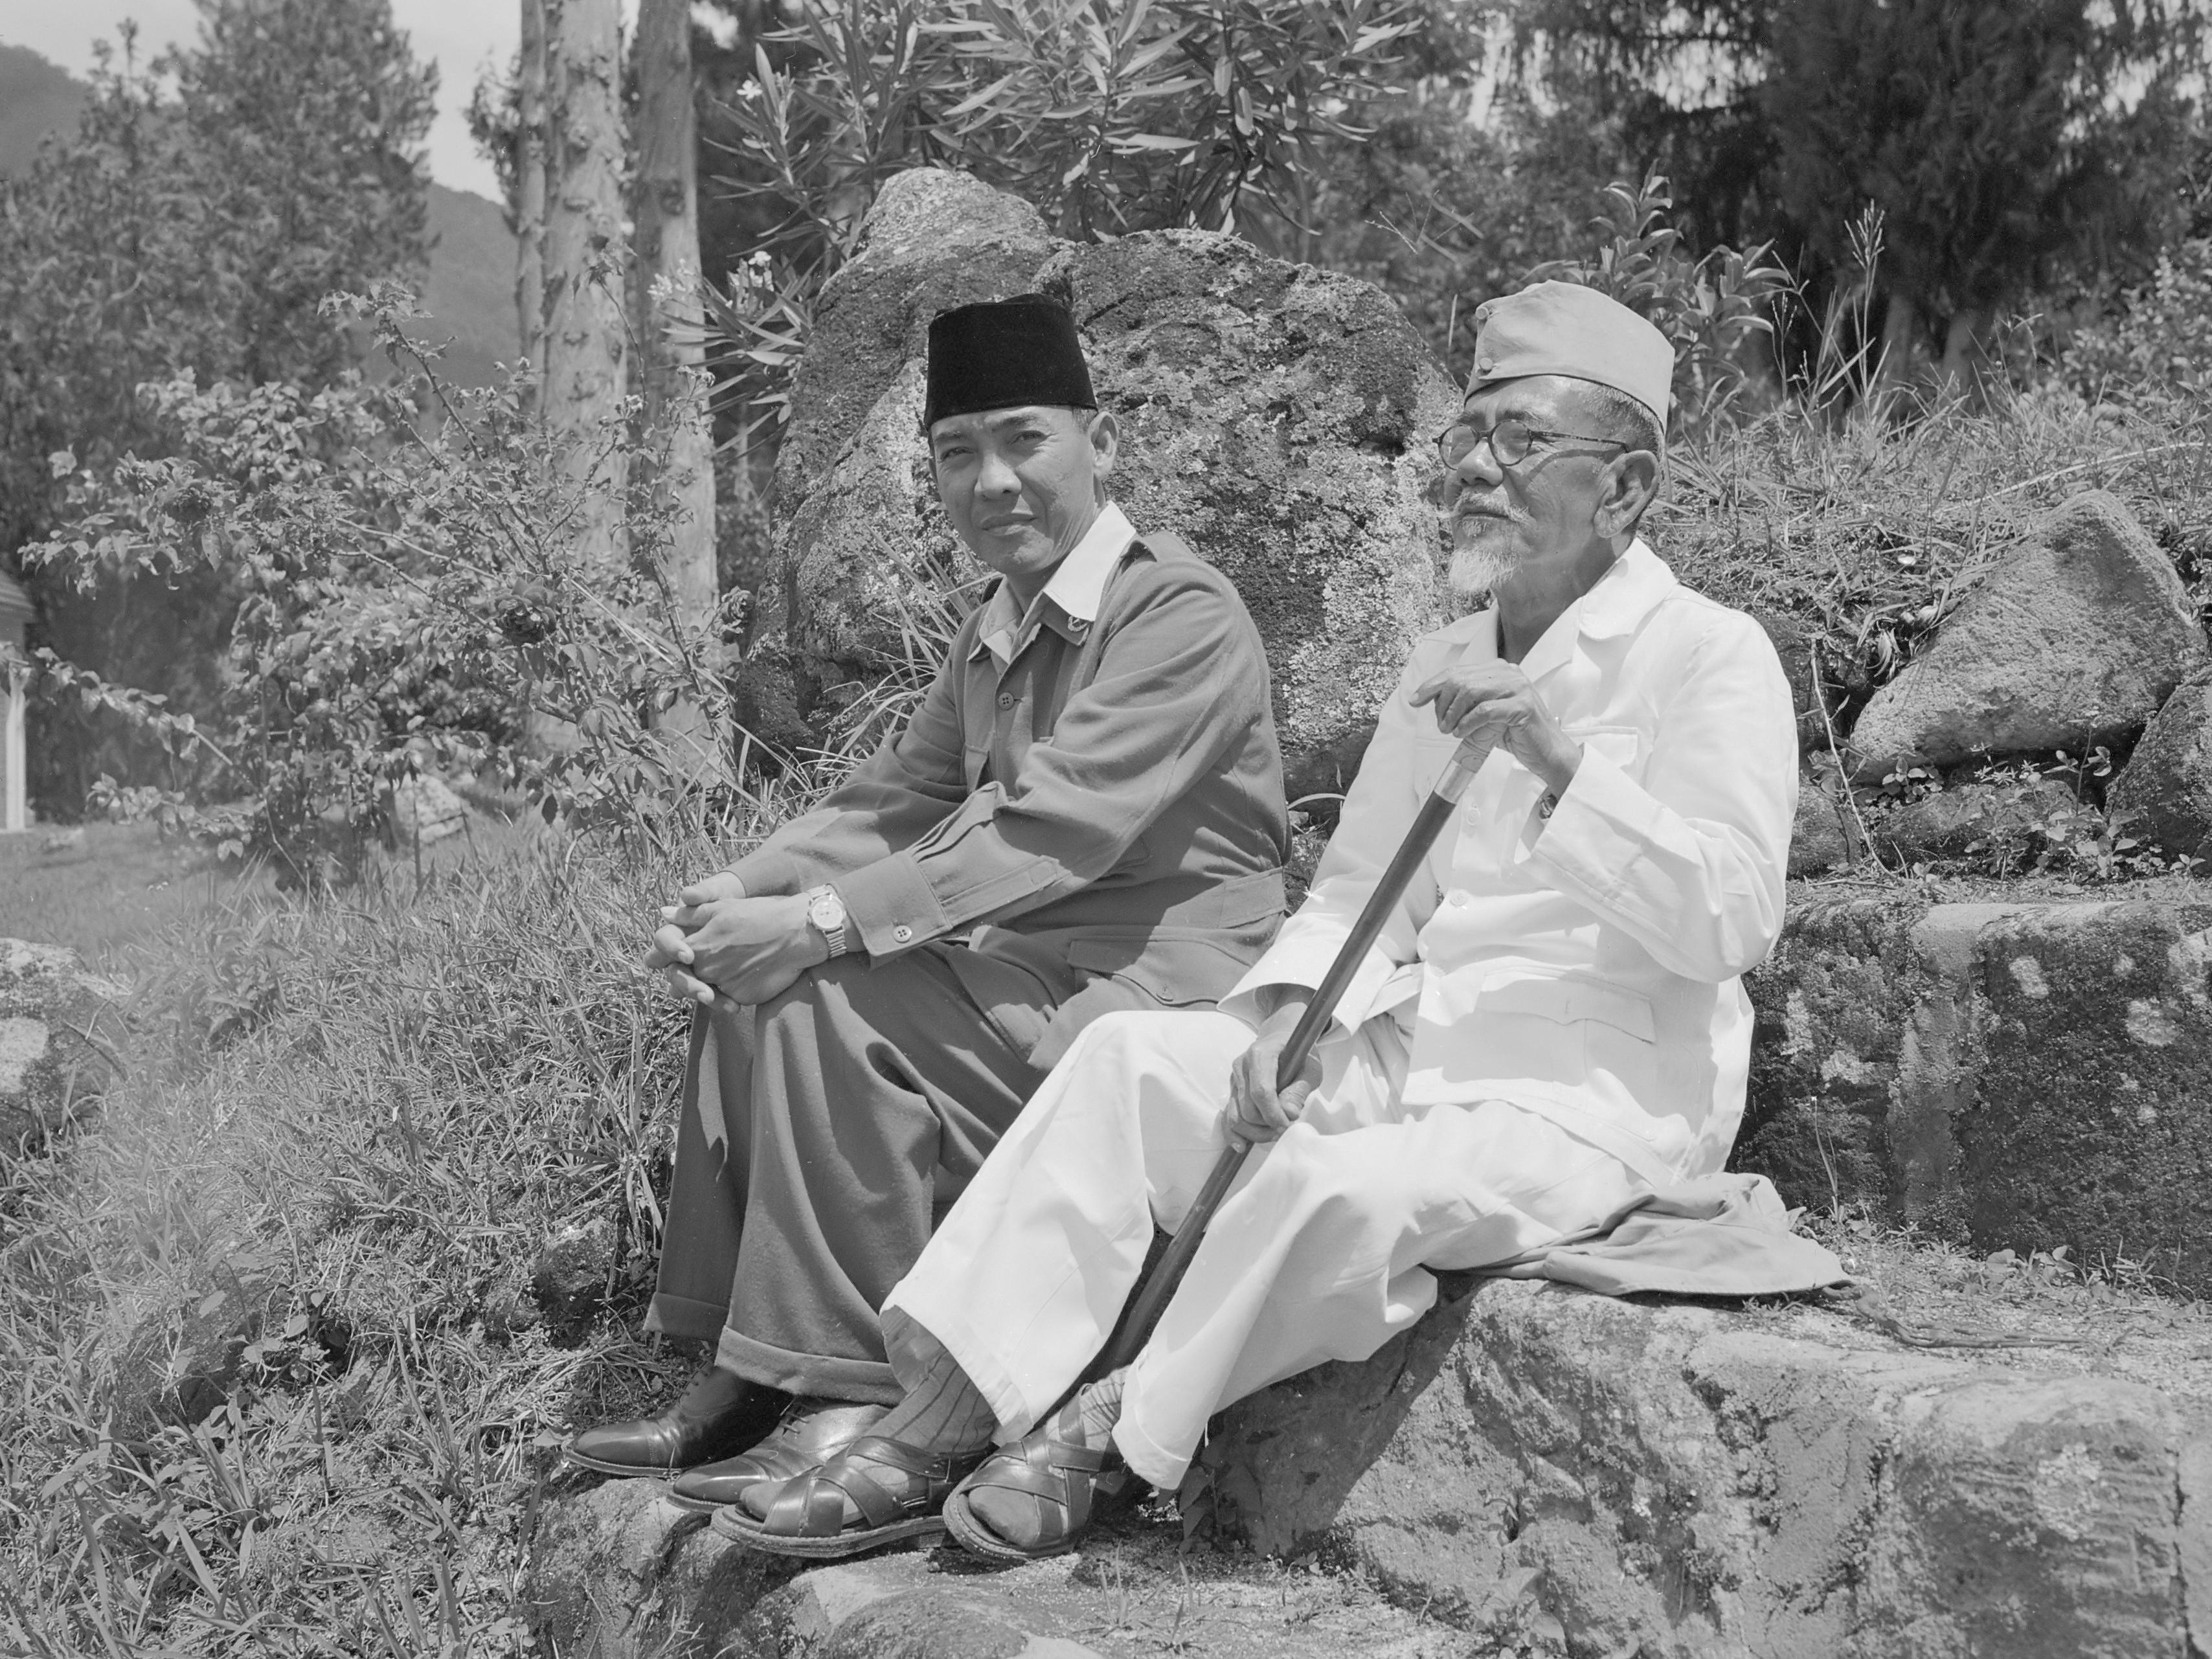 COLLECTIE_TROPENMUSEUM_President_Soekarno_tijdens_een_wandeling_met_Hadji_Agus_Salim_TMnr_10018810.jpg